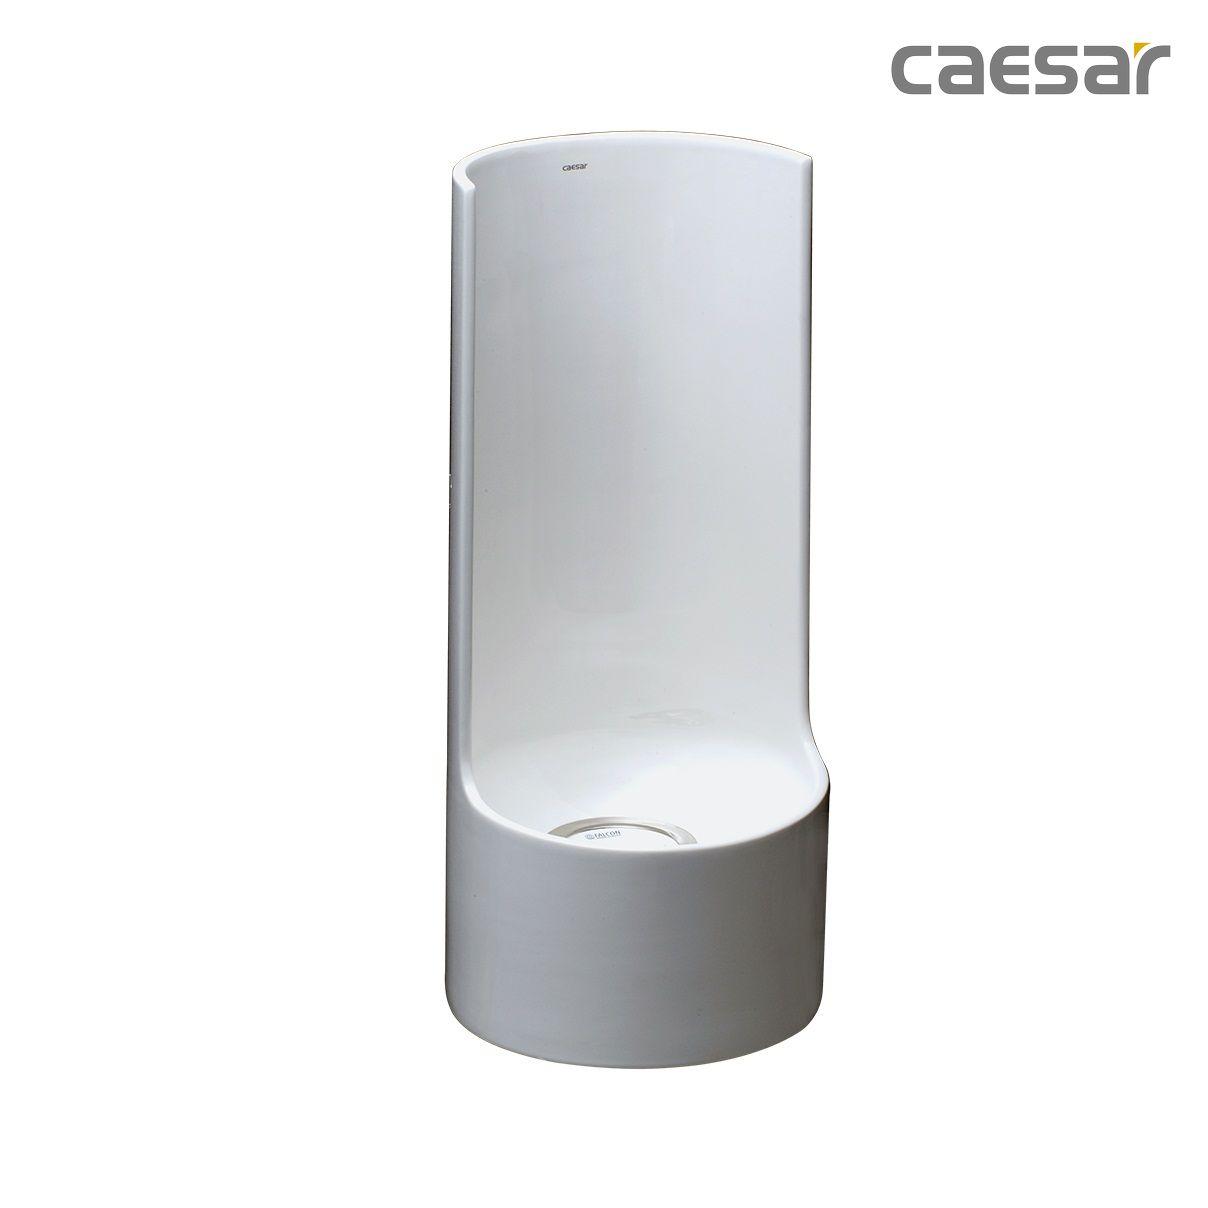 bon-tieu-caesar-uf0286